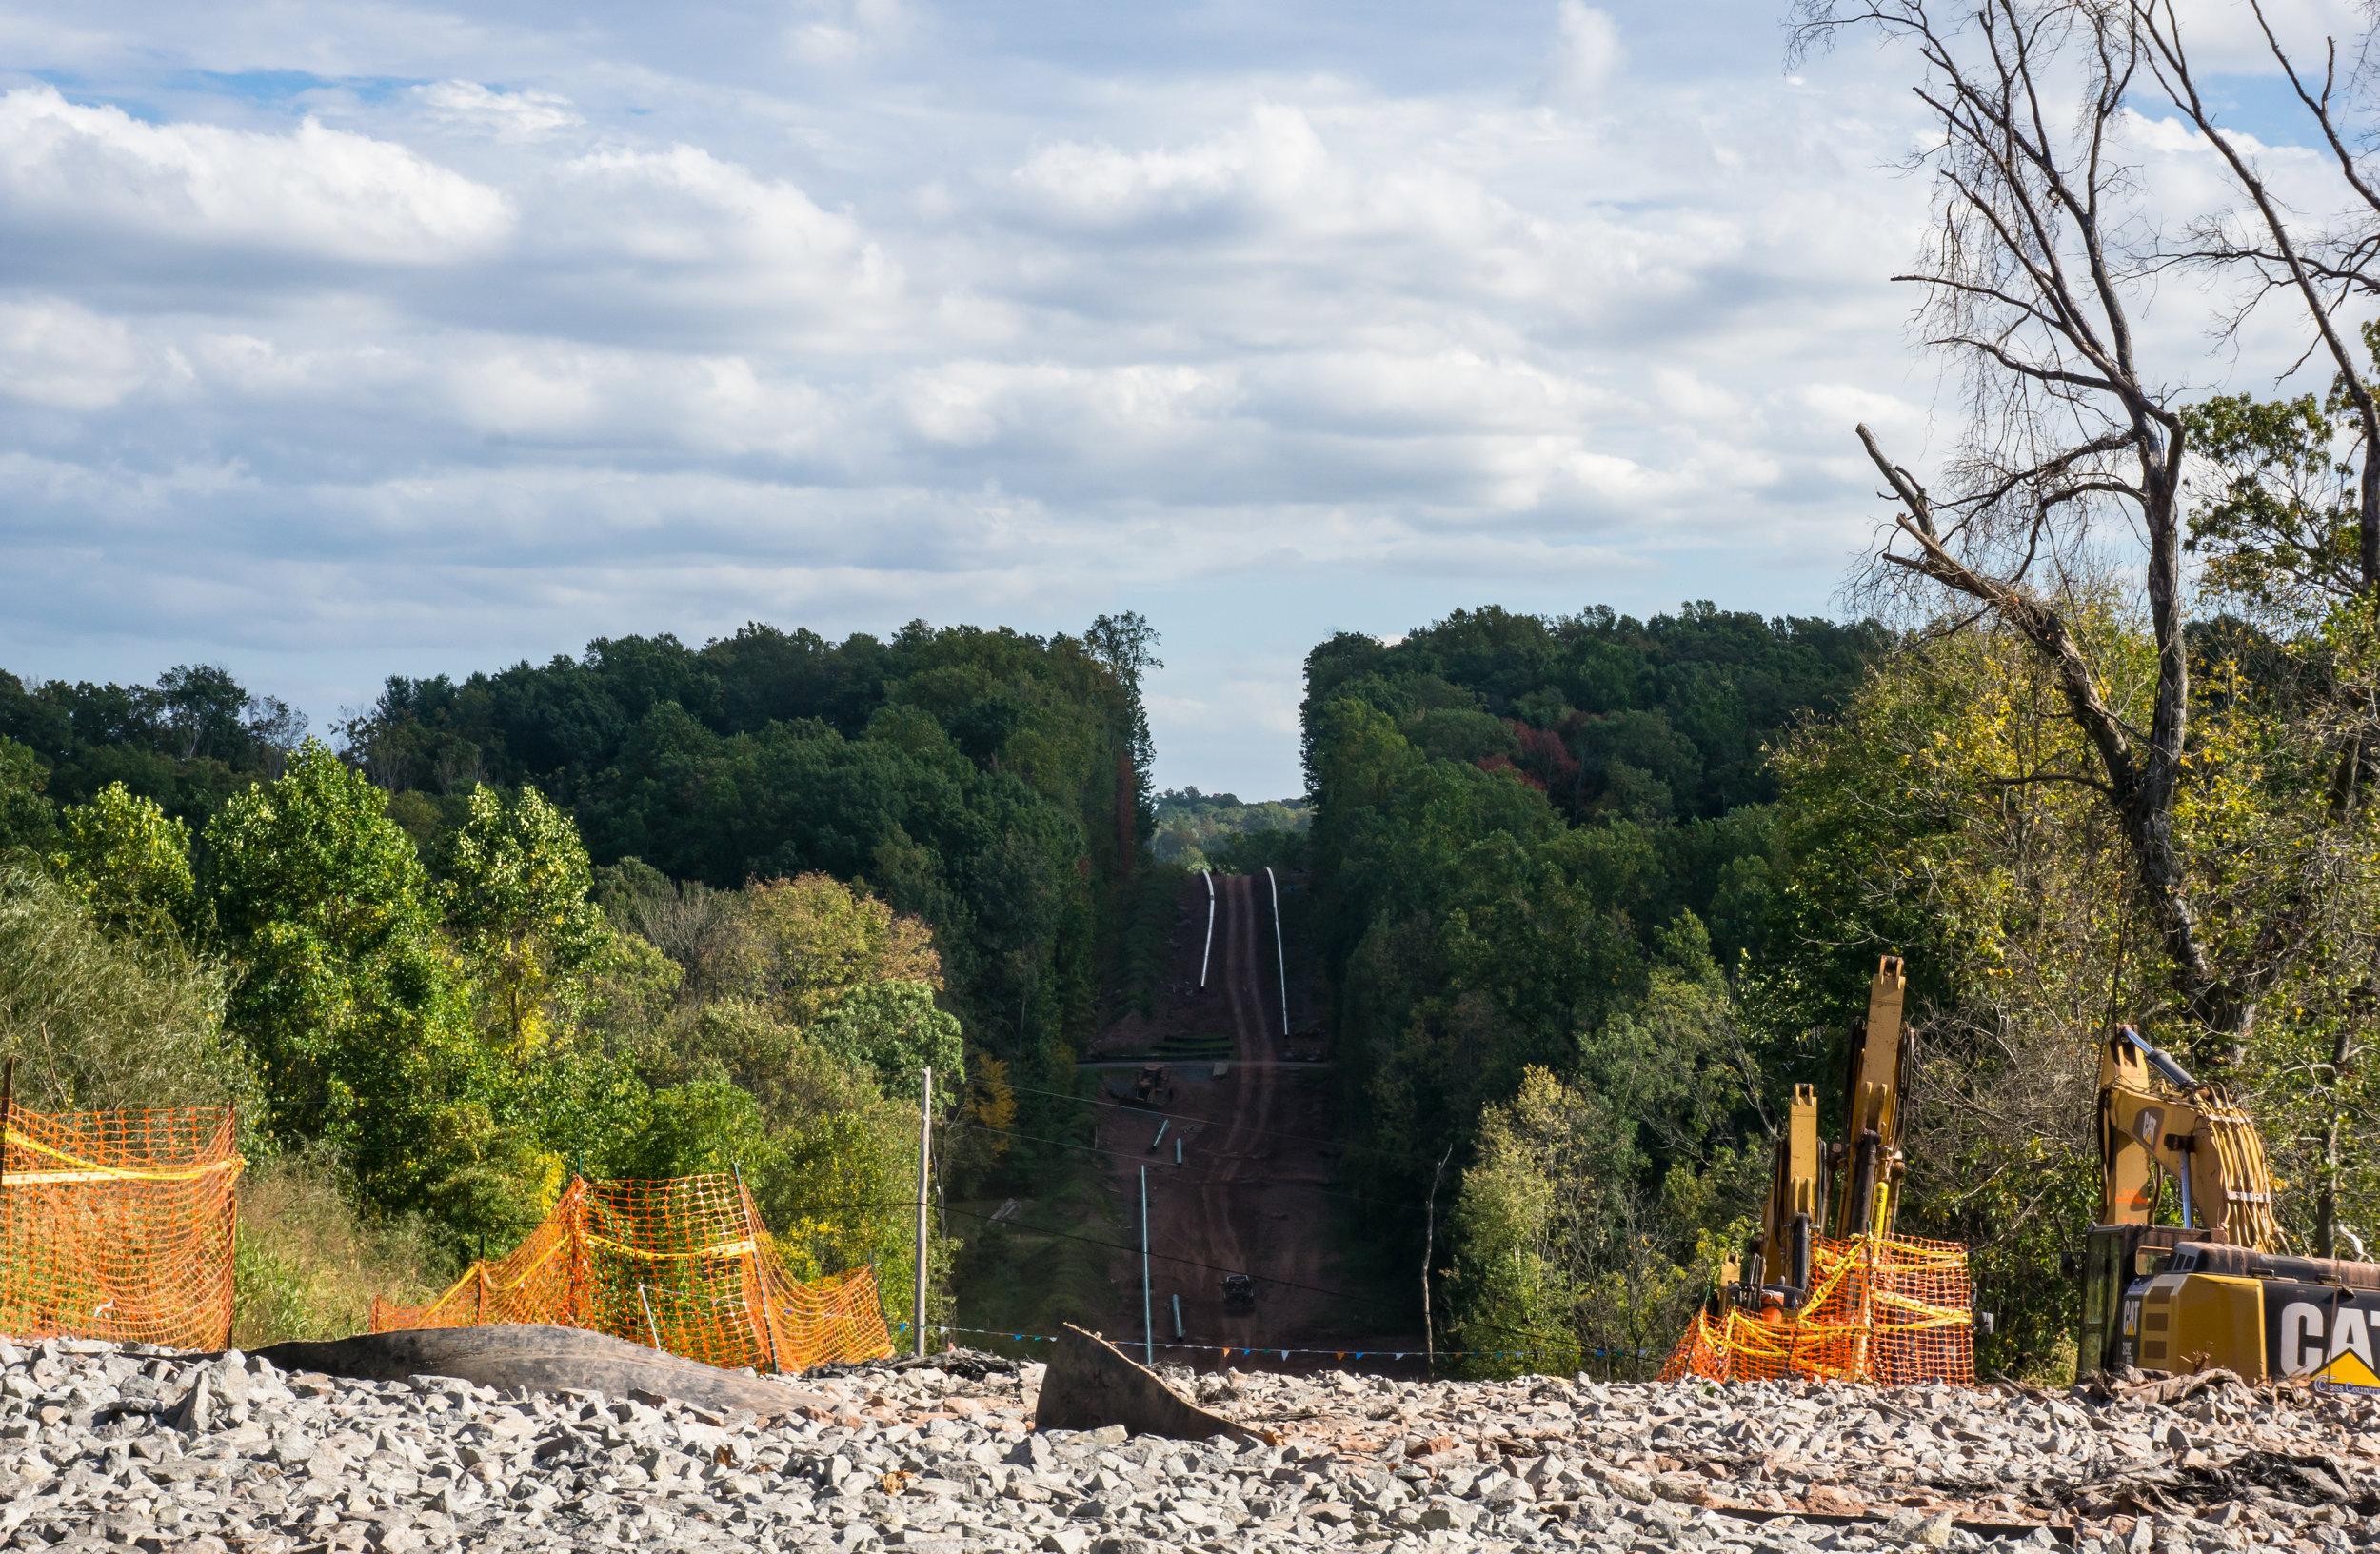 1369 - Pipeline - Cut through the hills Autumn